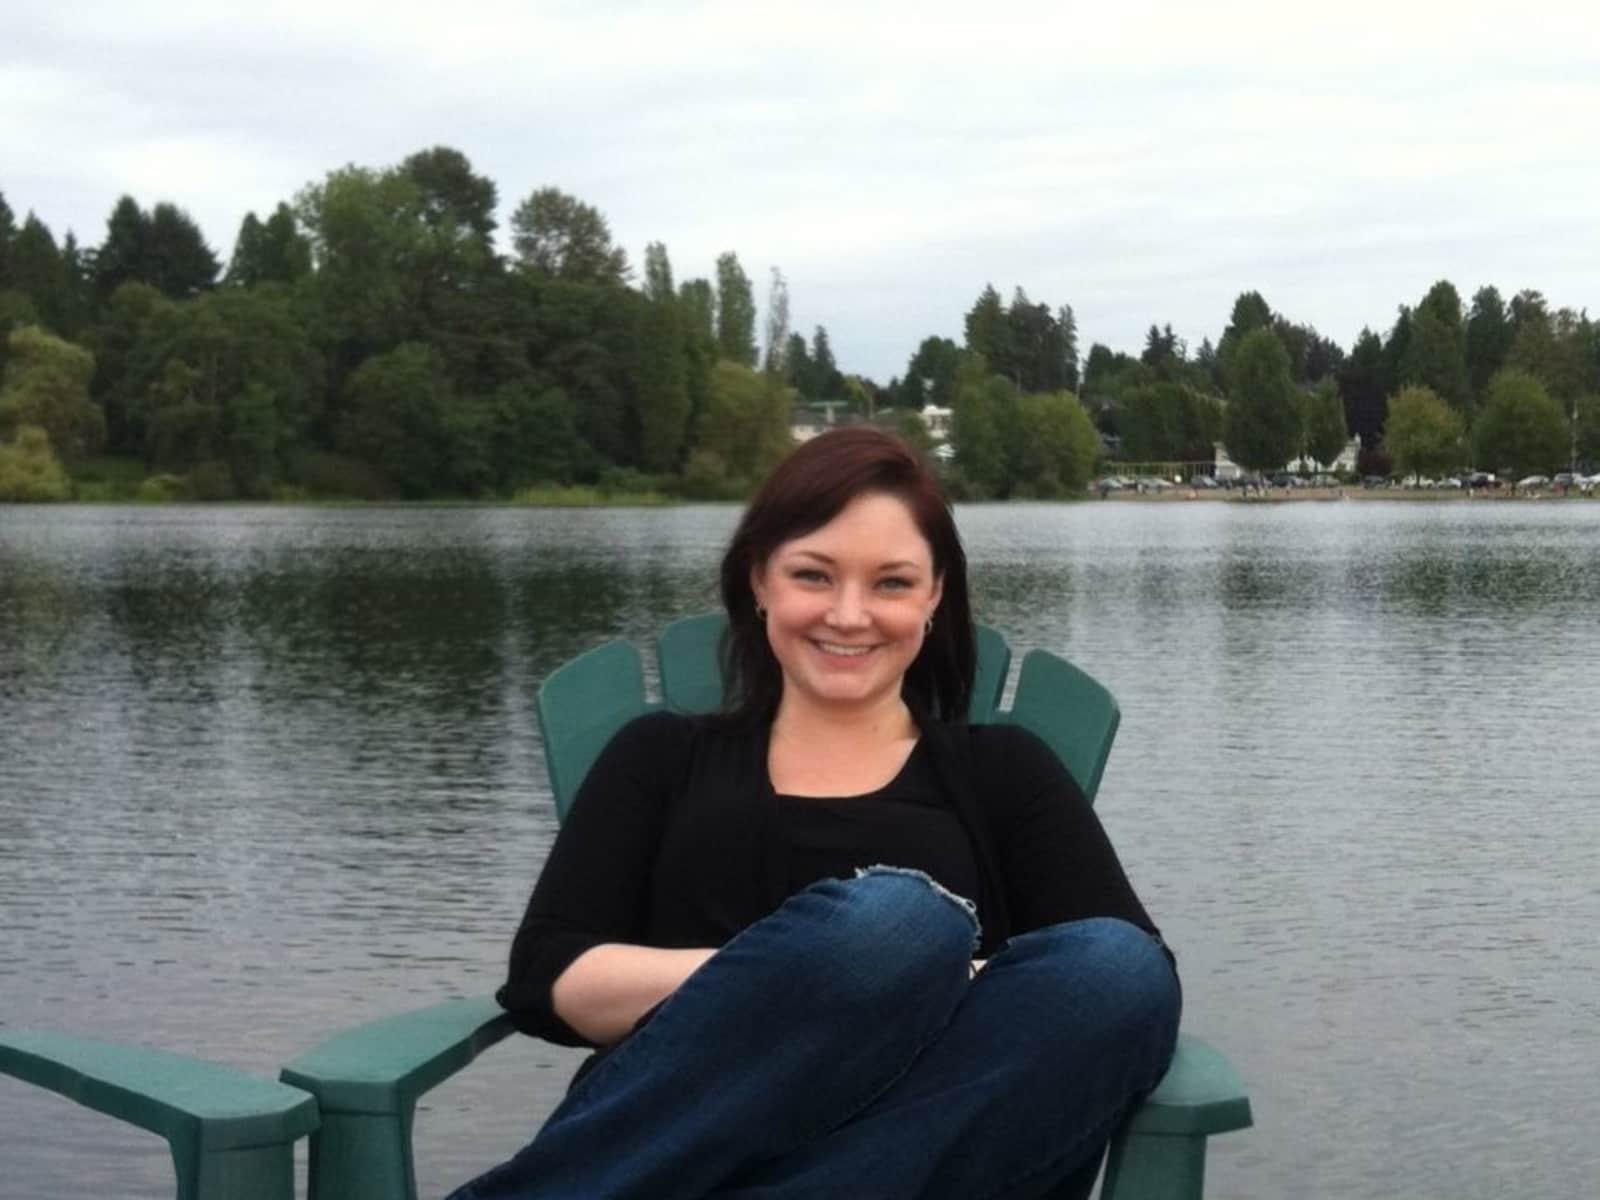 Kerissa from Auckland, New Zealand